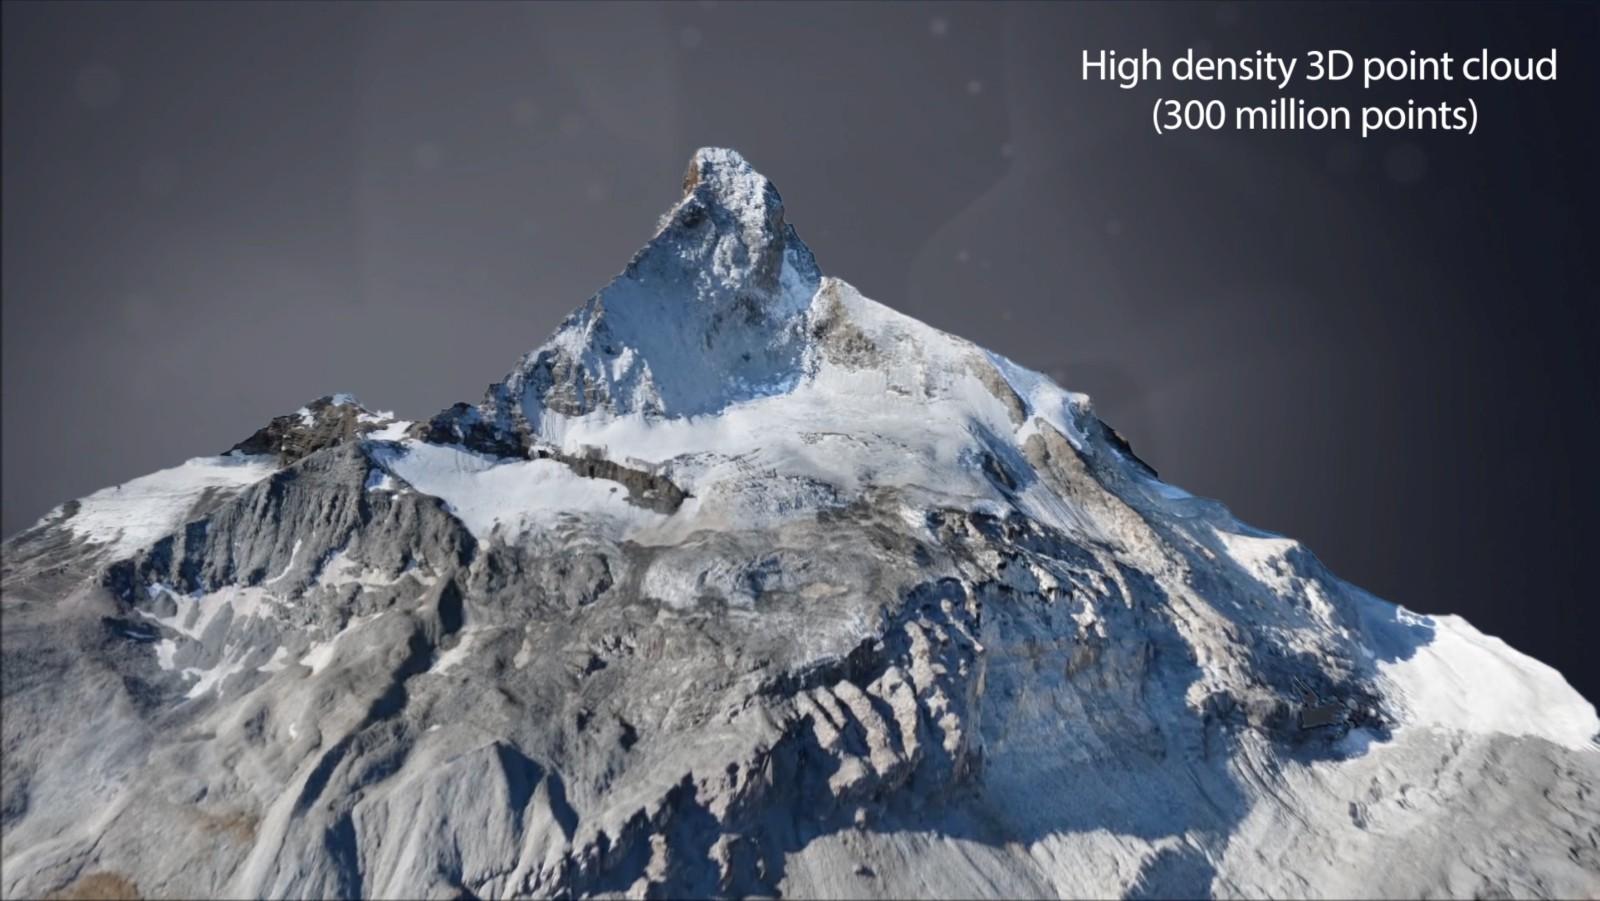 High density 3D point cloud2